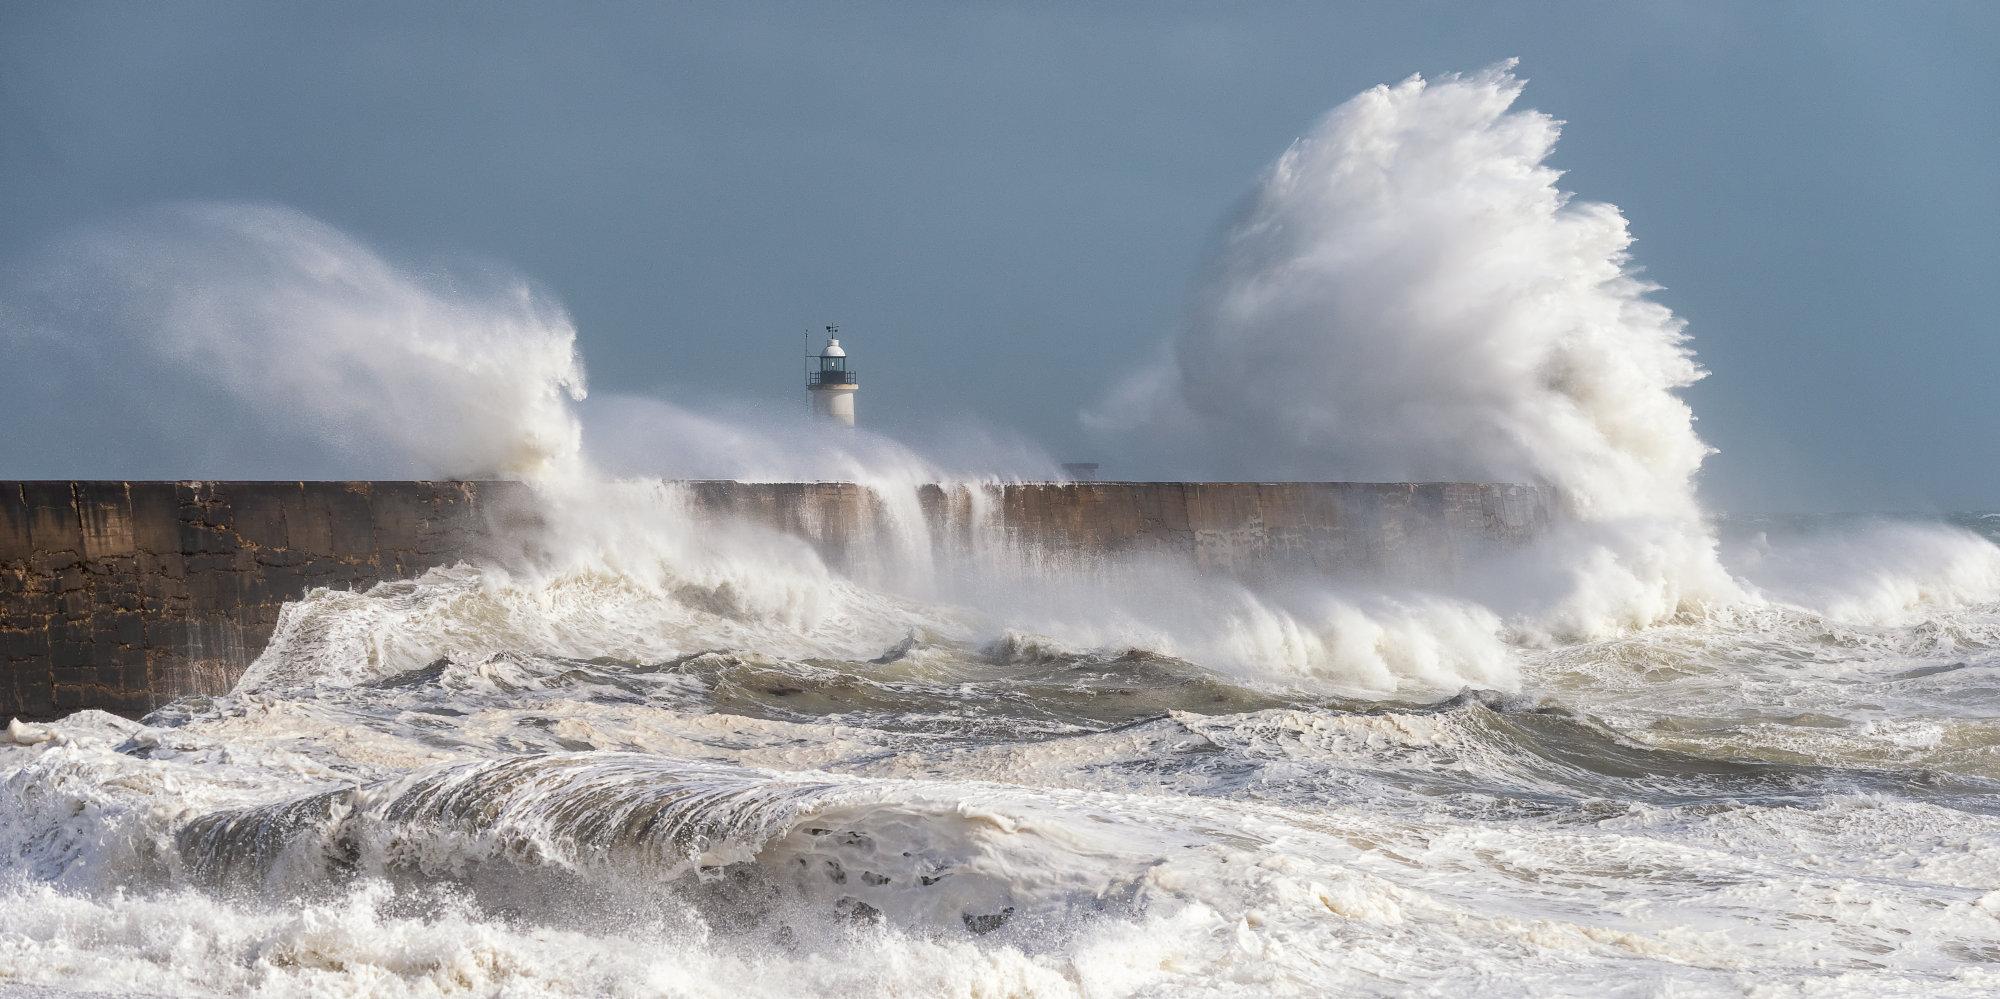 Storm tossed sea!